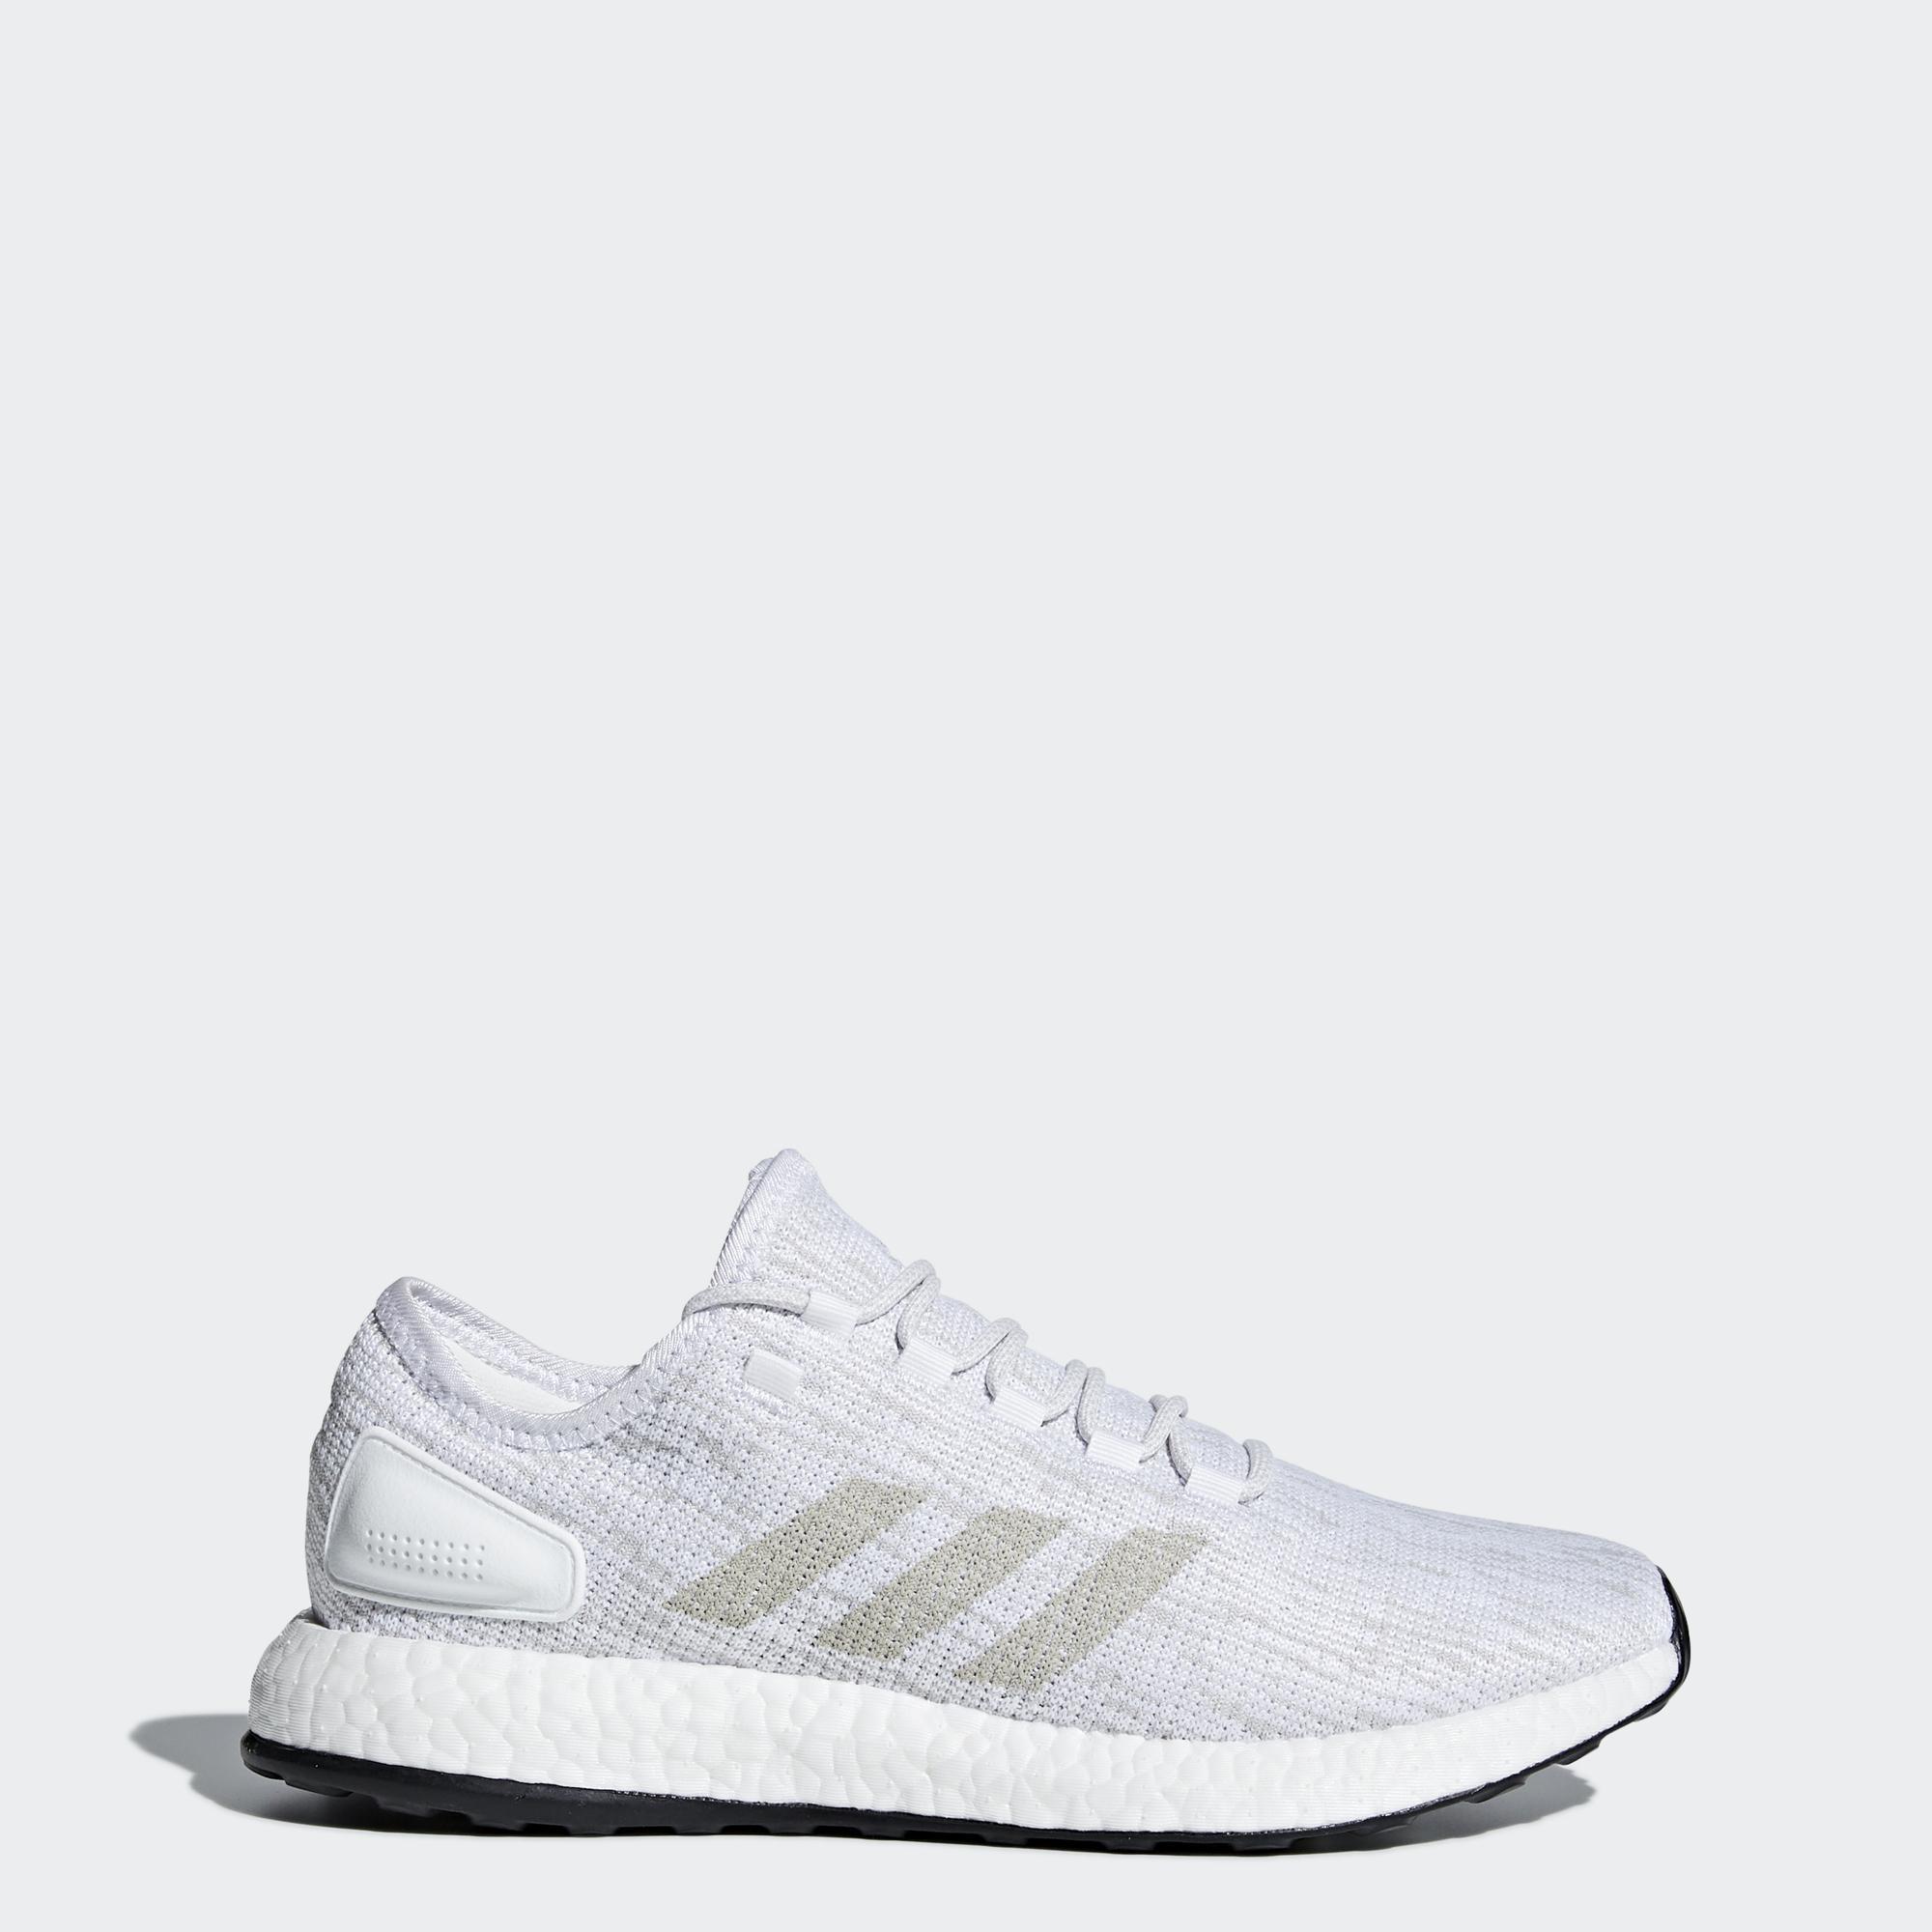 Adidas Scarpe Pureboost